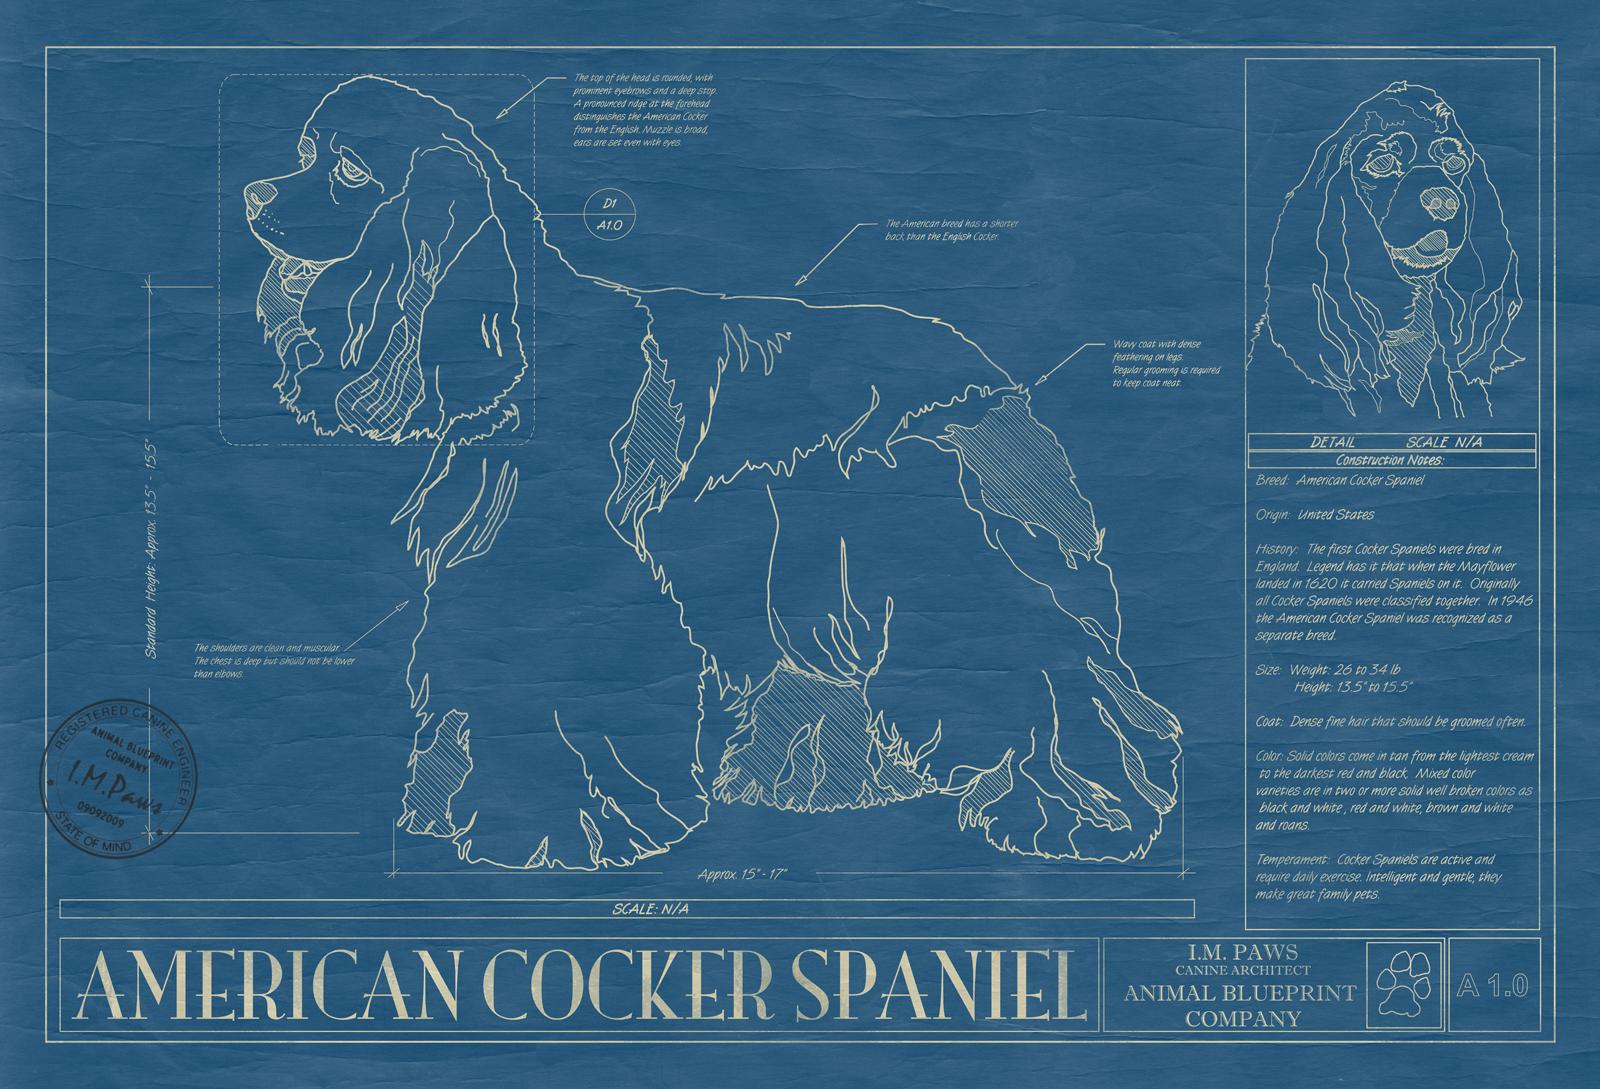 Cocker spaniel american animal blueprint company click image to enlarge malvernweather Choice Image